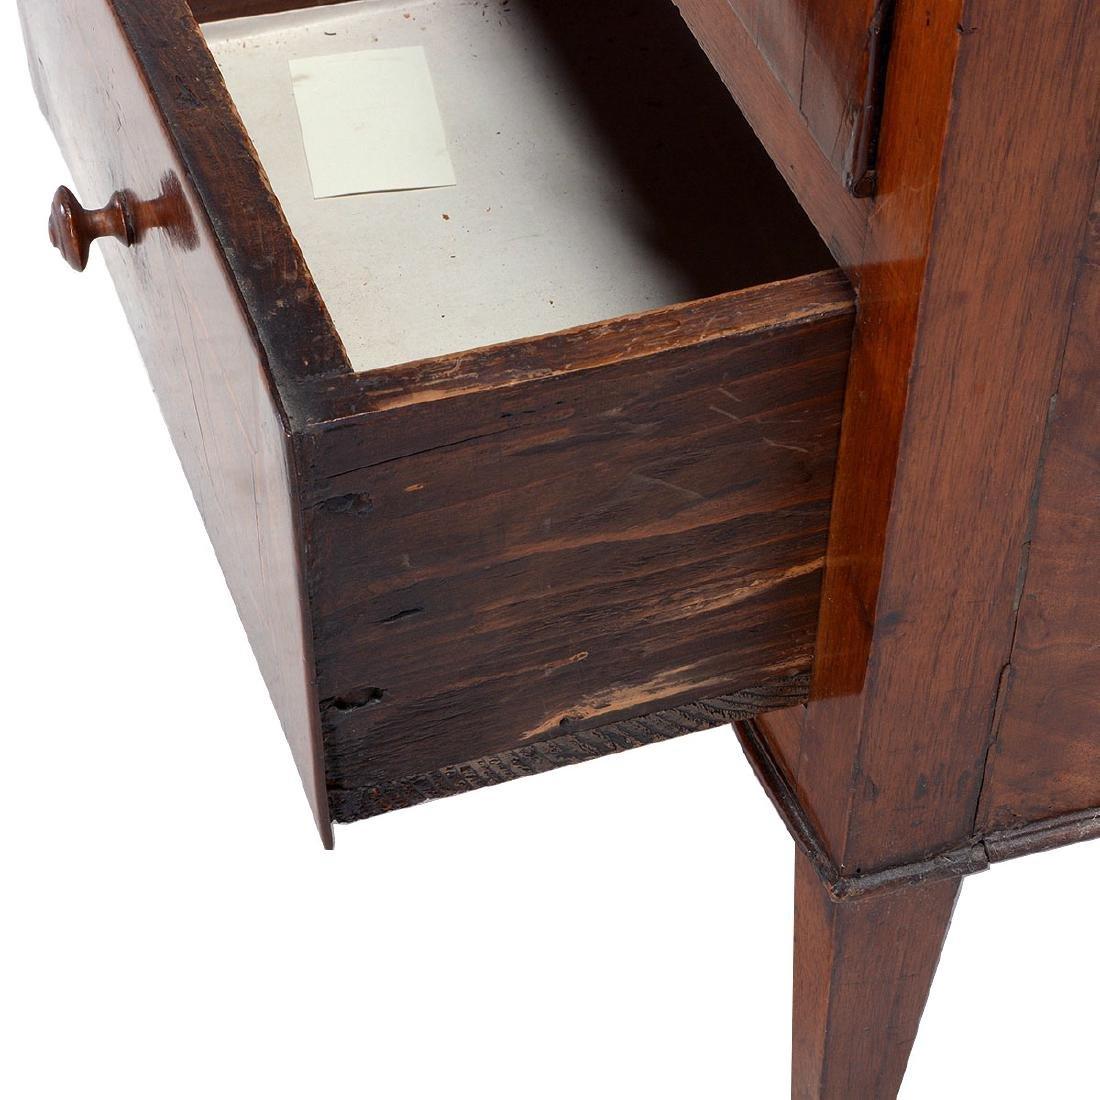 North Italian Neoclassical Inlaid Walnut Cabinet, Late - 5